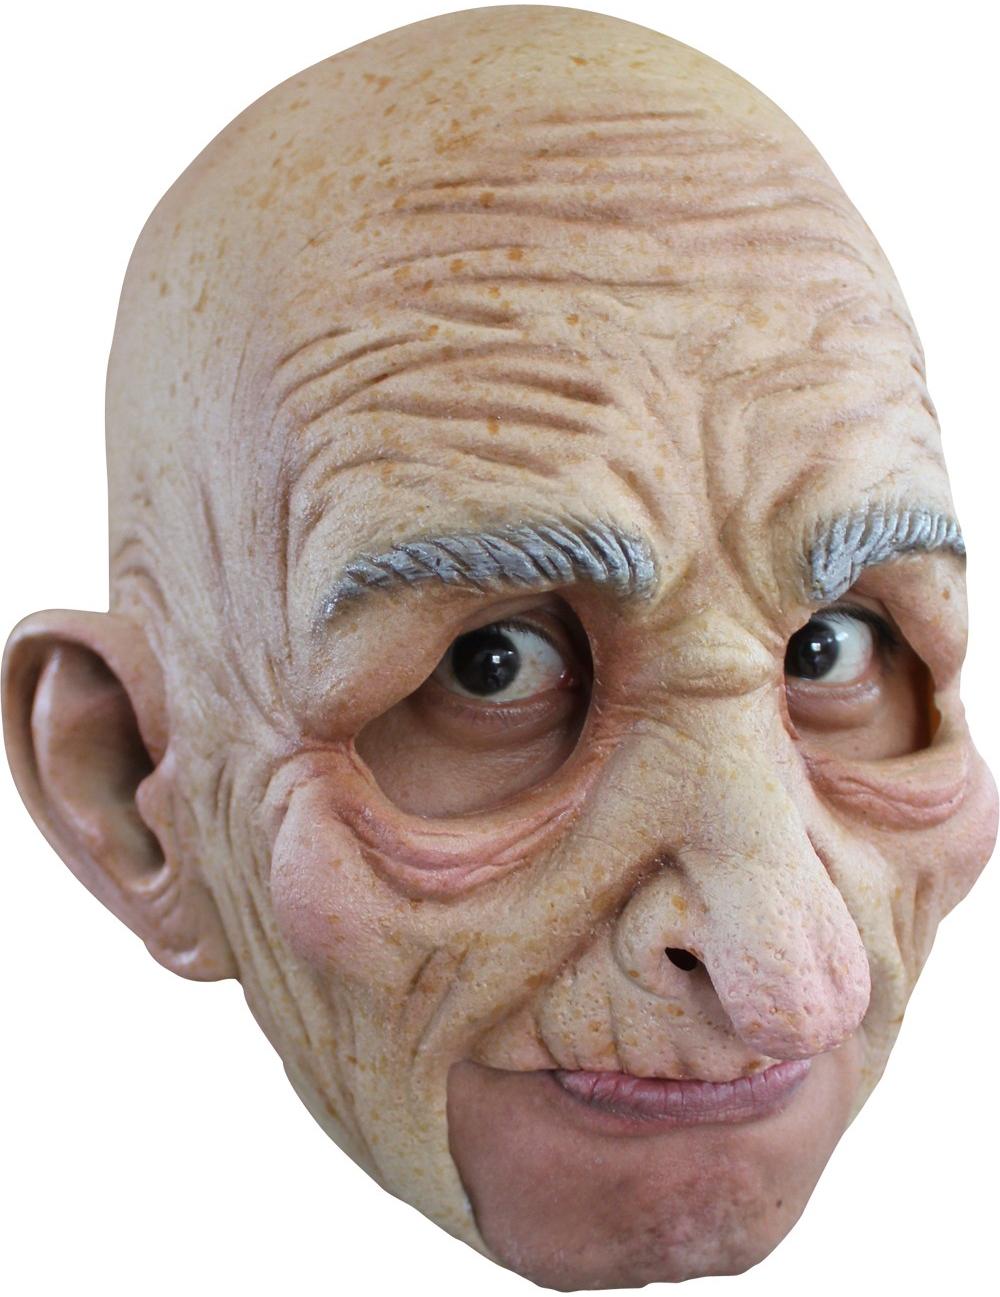 Masque deguisement homme deguisement pas cher garcon ... 9996174d2ad9